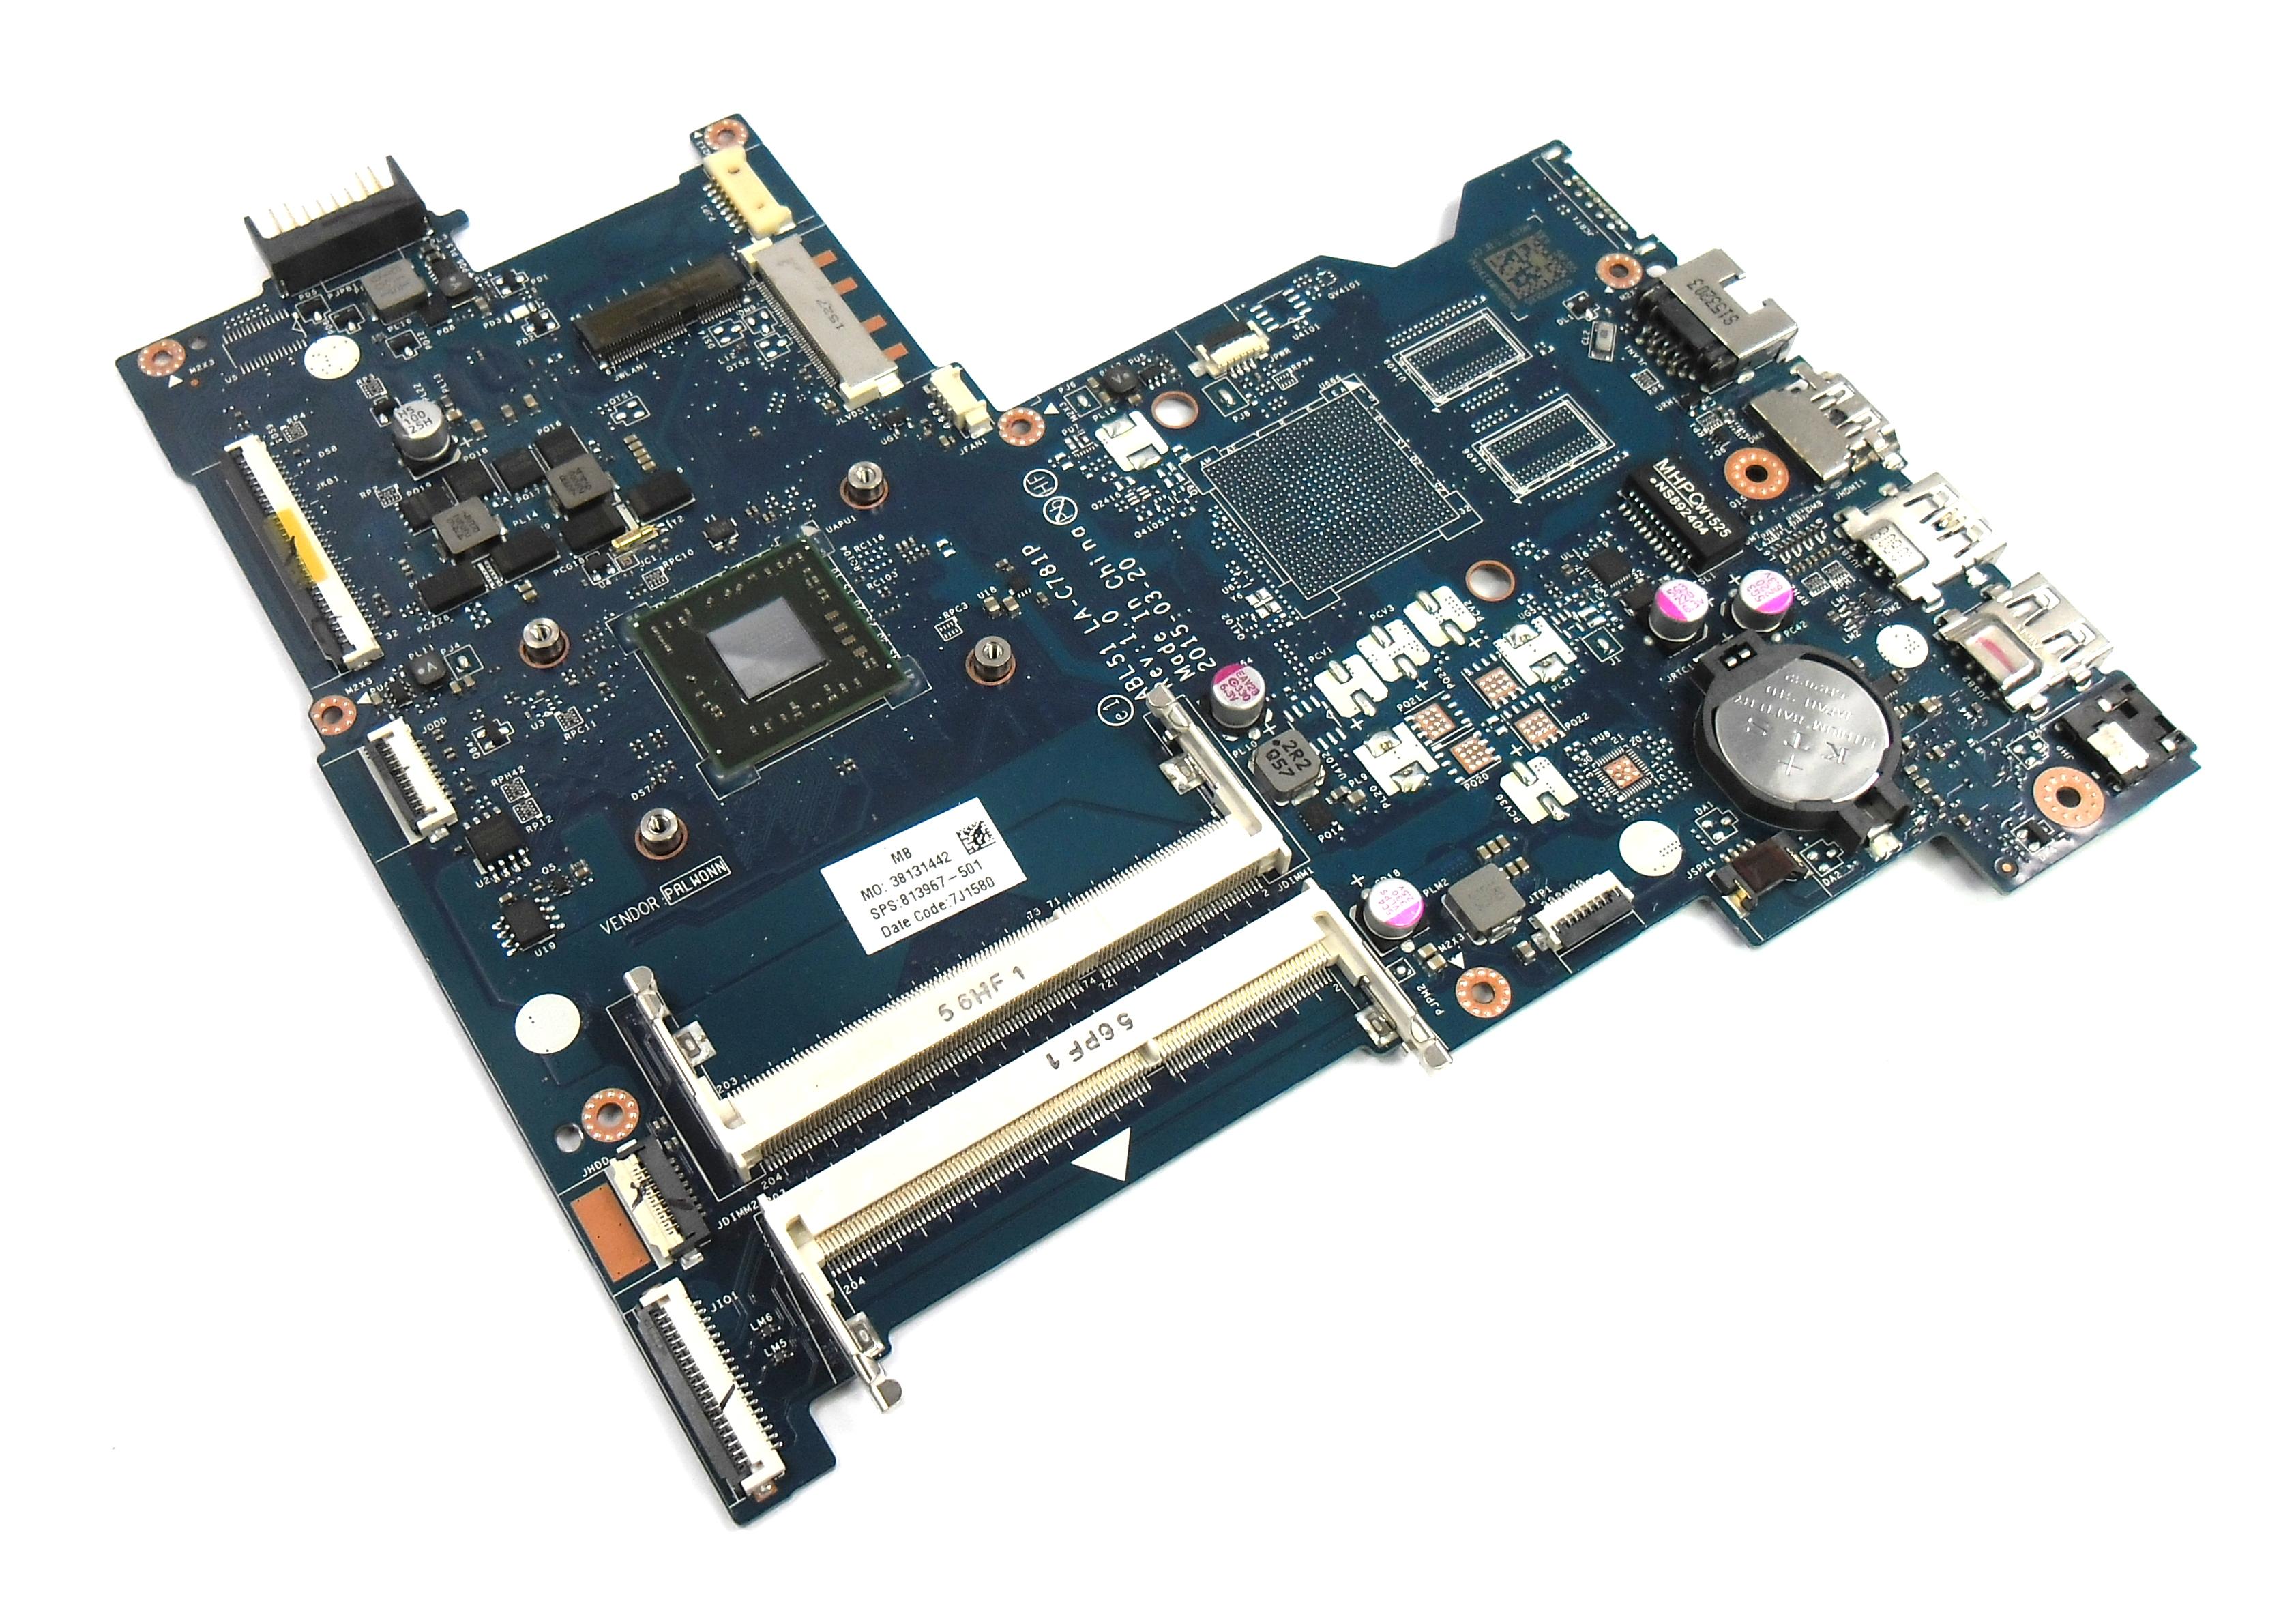 HP 813967-501 Pavilion 15-af156sa Motherboard with AMD A6-6310 Processor